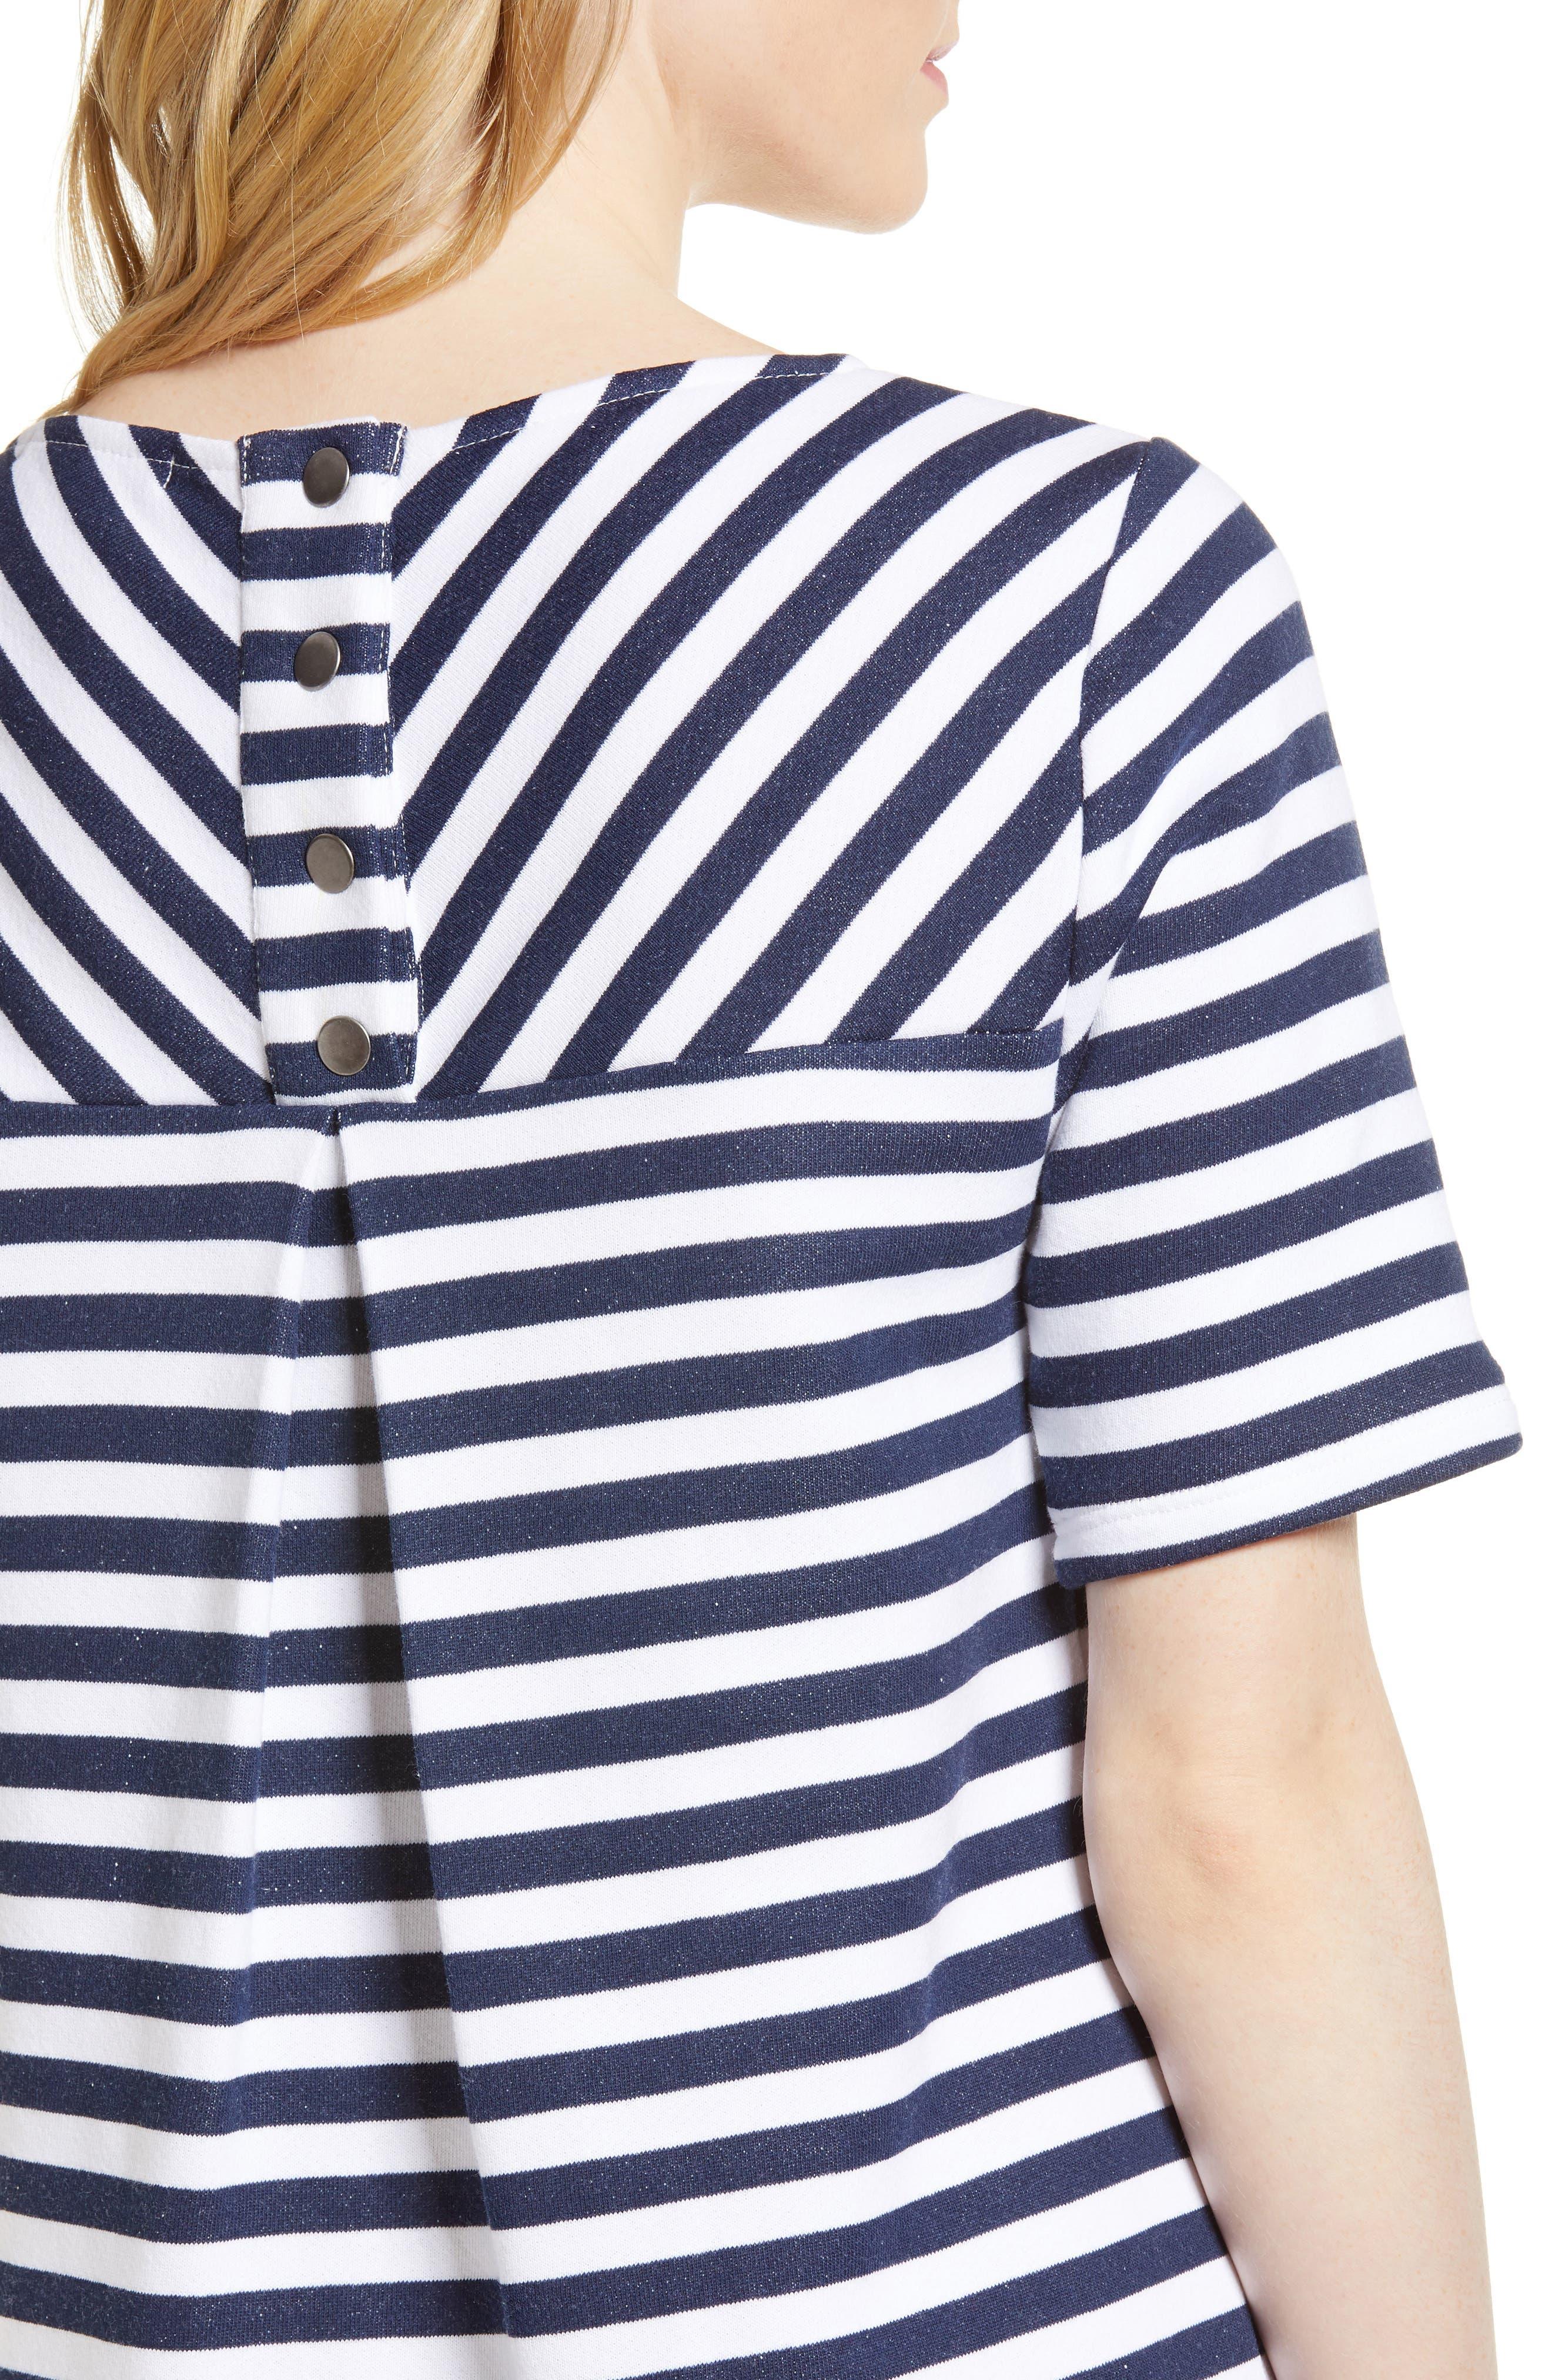 Pleat Back Minidress,                             Alternate thumbnail 4, color,                             Navy/ Ivory Stripe